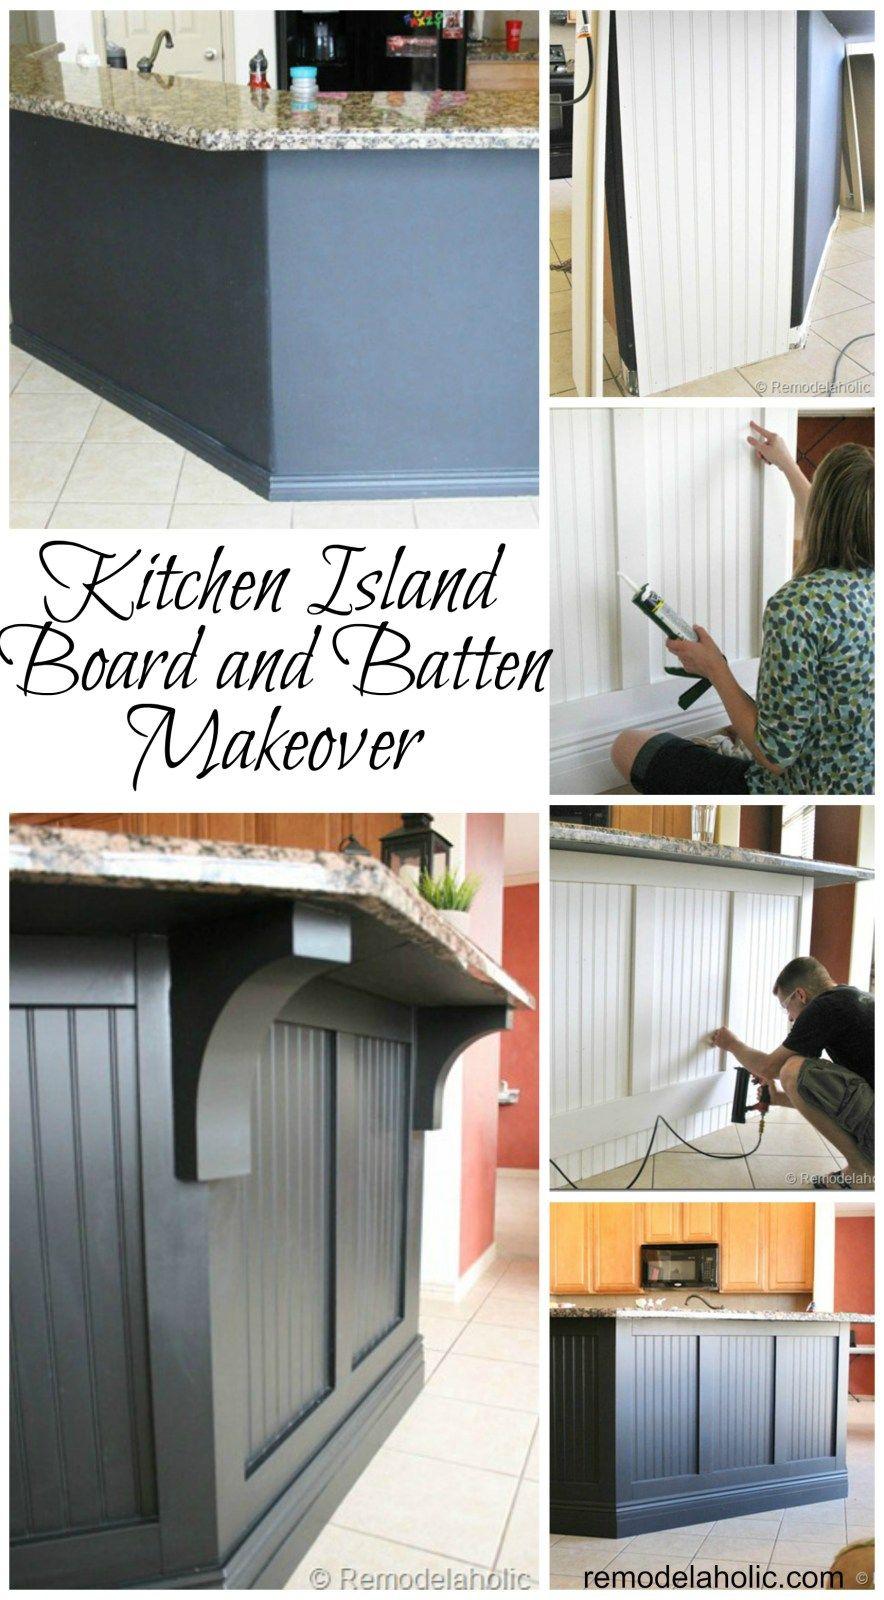 Starter Home To Dream Home The Kitchen Island Reveal Kitchen Island Makeover Diy Kitchen Island Kitchen Island Cabinets